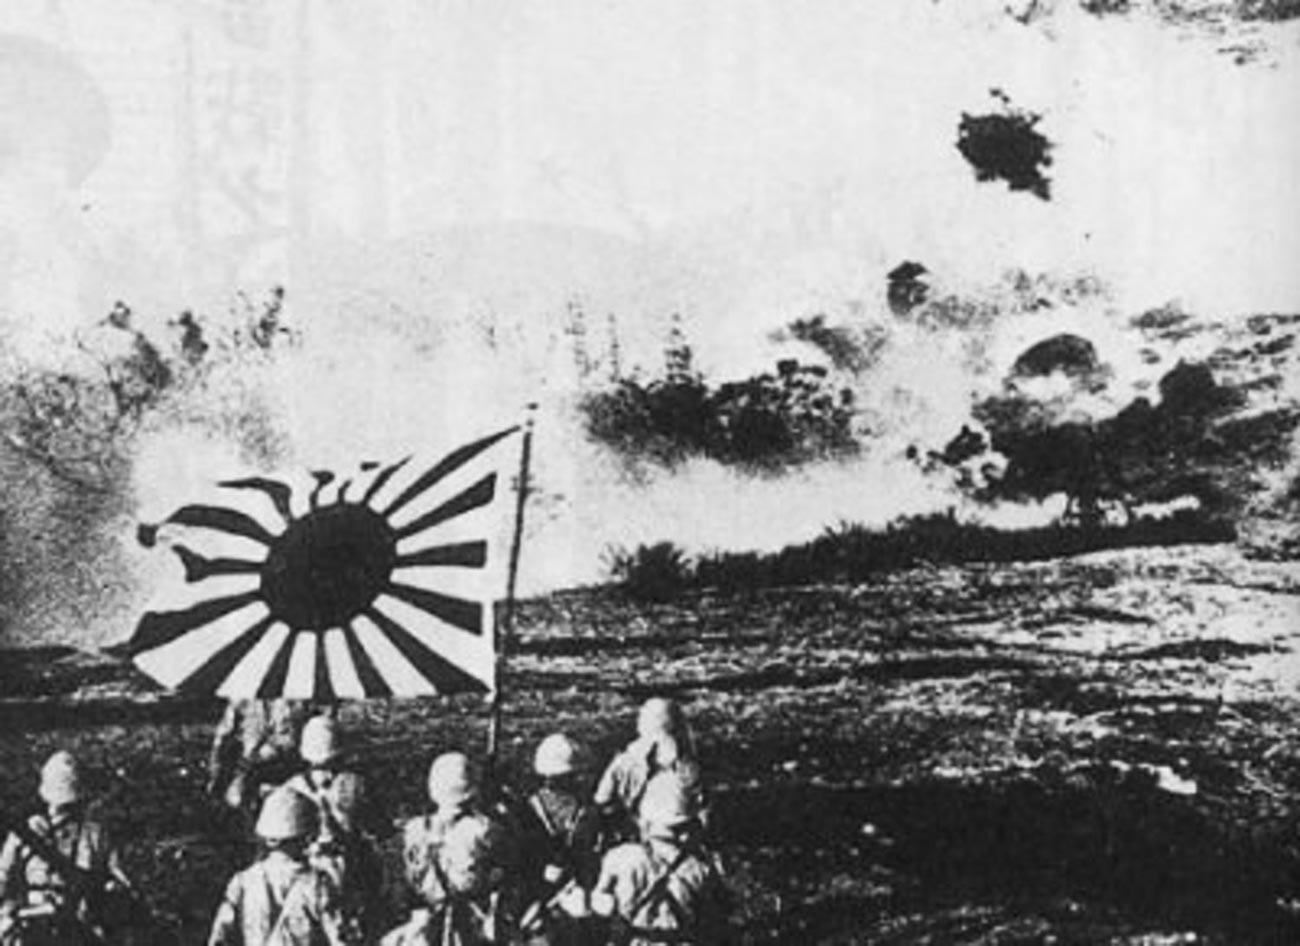 日本軍は広東地区を占領